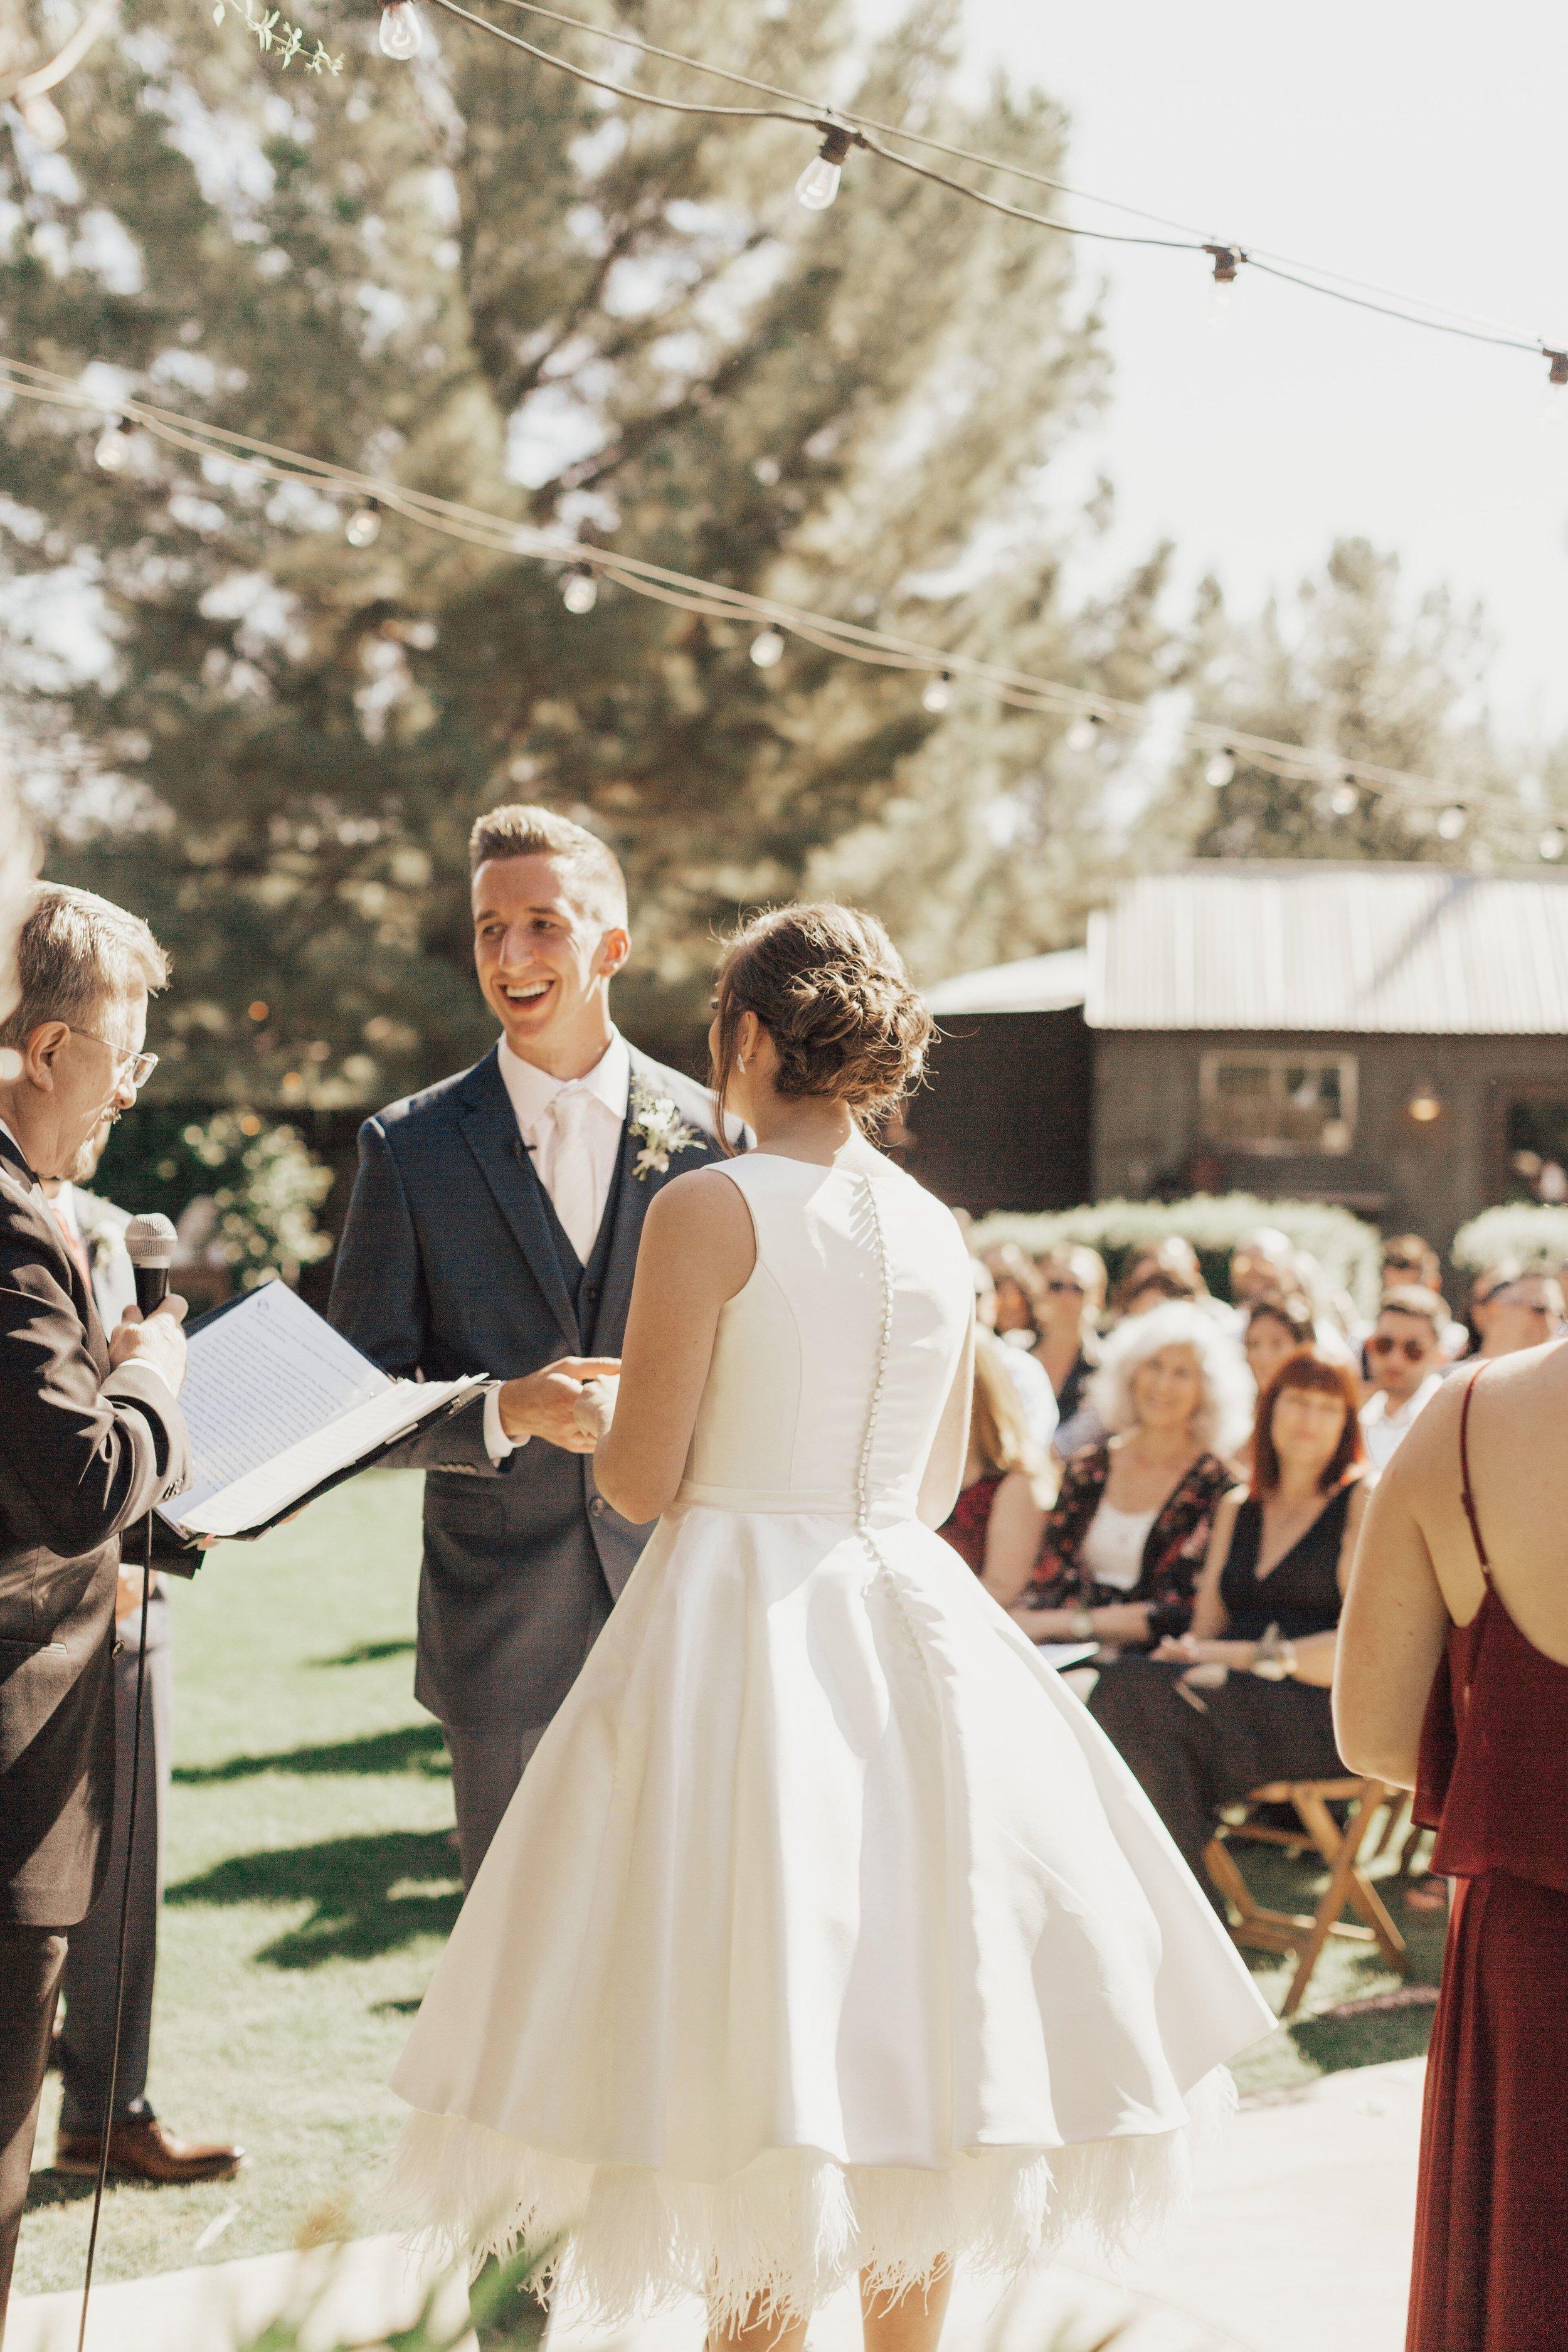 Ceremony_Wedding_Sentimental_Bride_Groom_BrideAndGroom